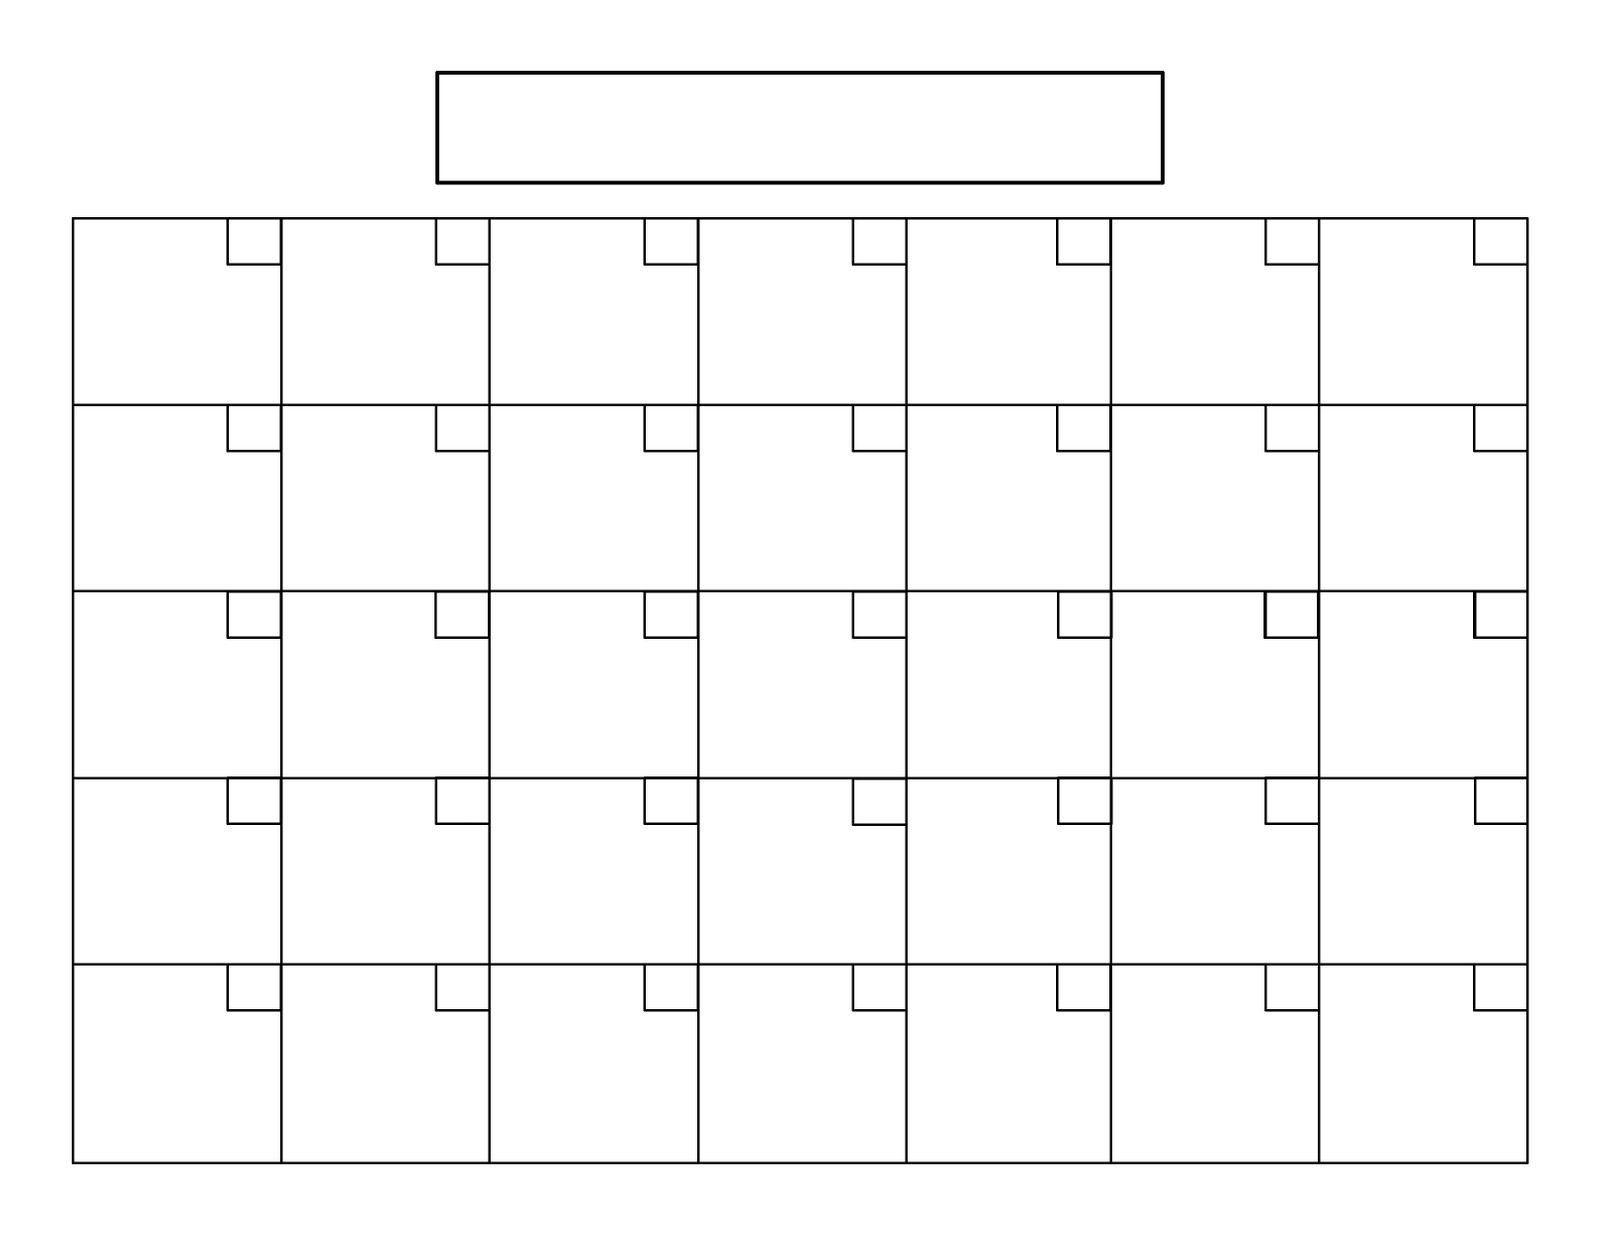 31 Day Month Calendar Printable In 2020 | Calendar